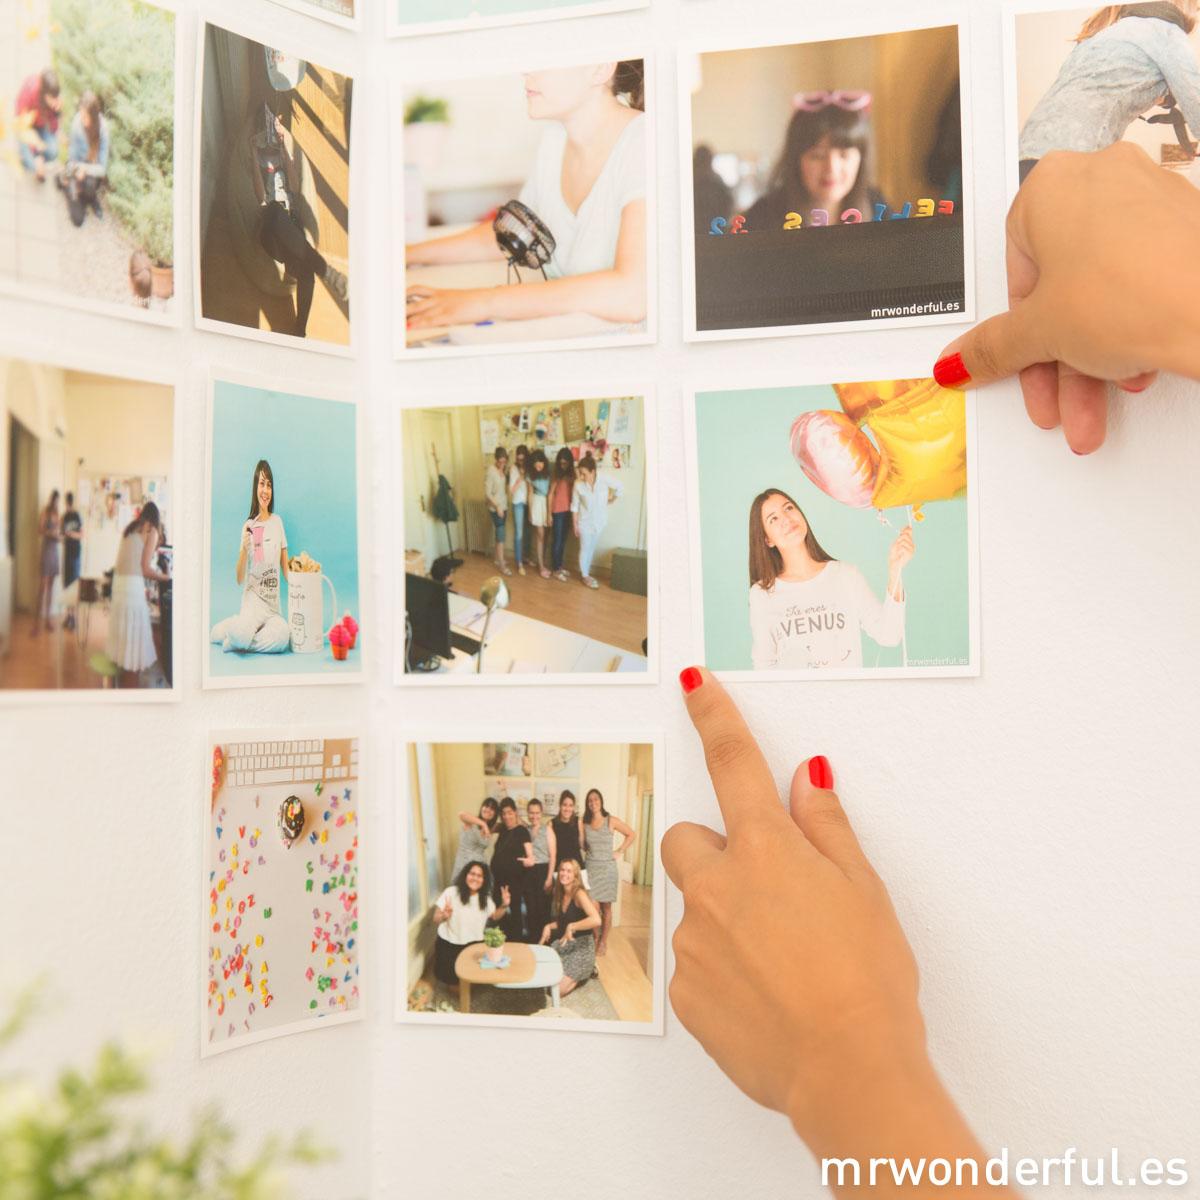 mrwonderful_paperlover_lo-mejor-del-estudio-wonder_2016-24-Editar